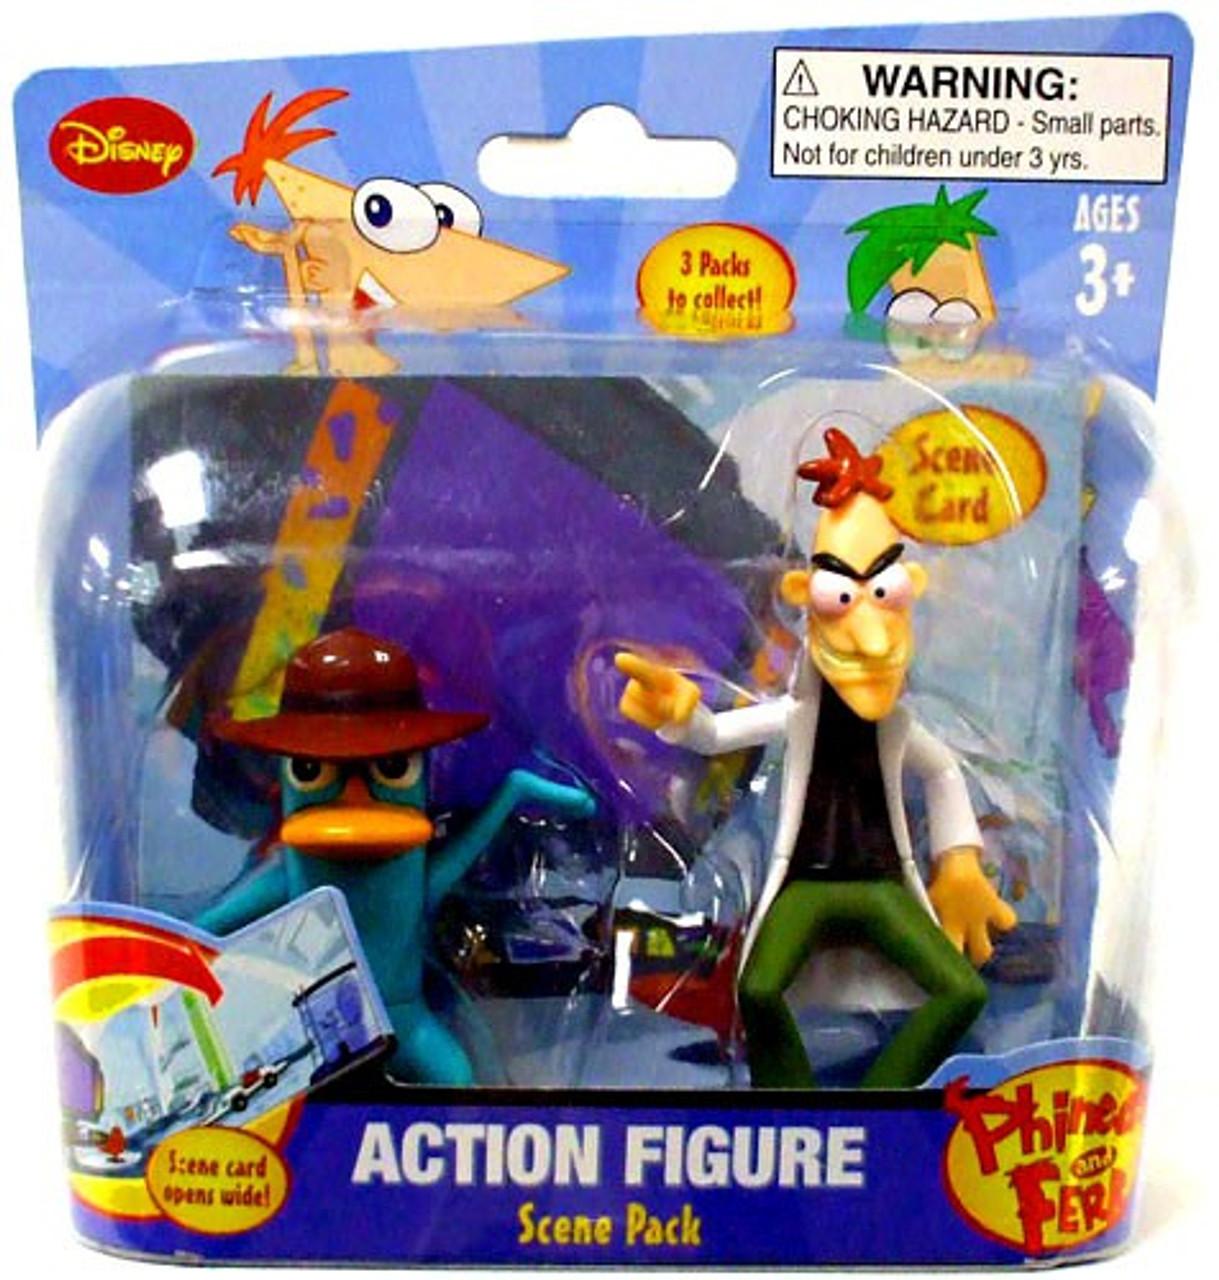 Disney Phineas and Ferb Scene Packs Dr. Doofenshmirtz & Agent P. Action Figure 2-Pack [Laboratory]